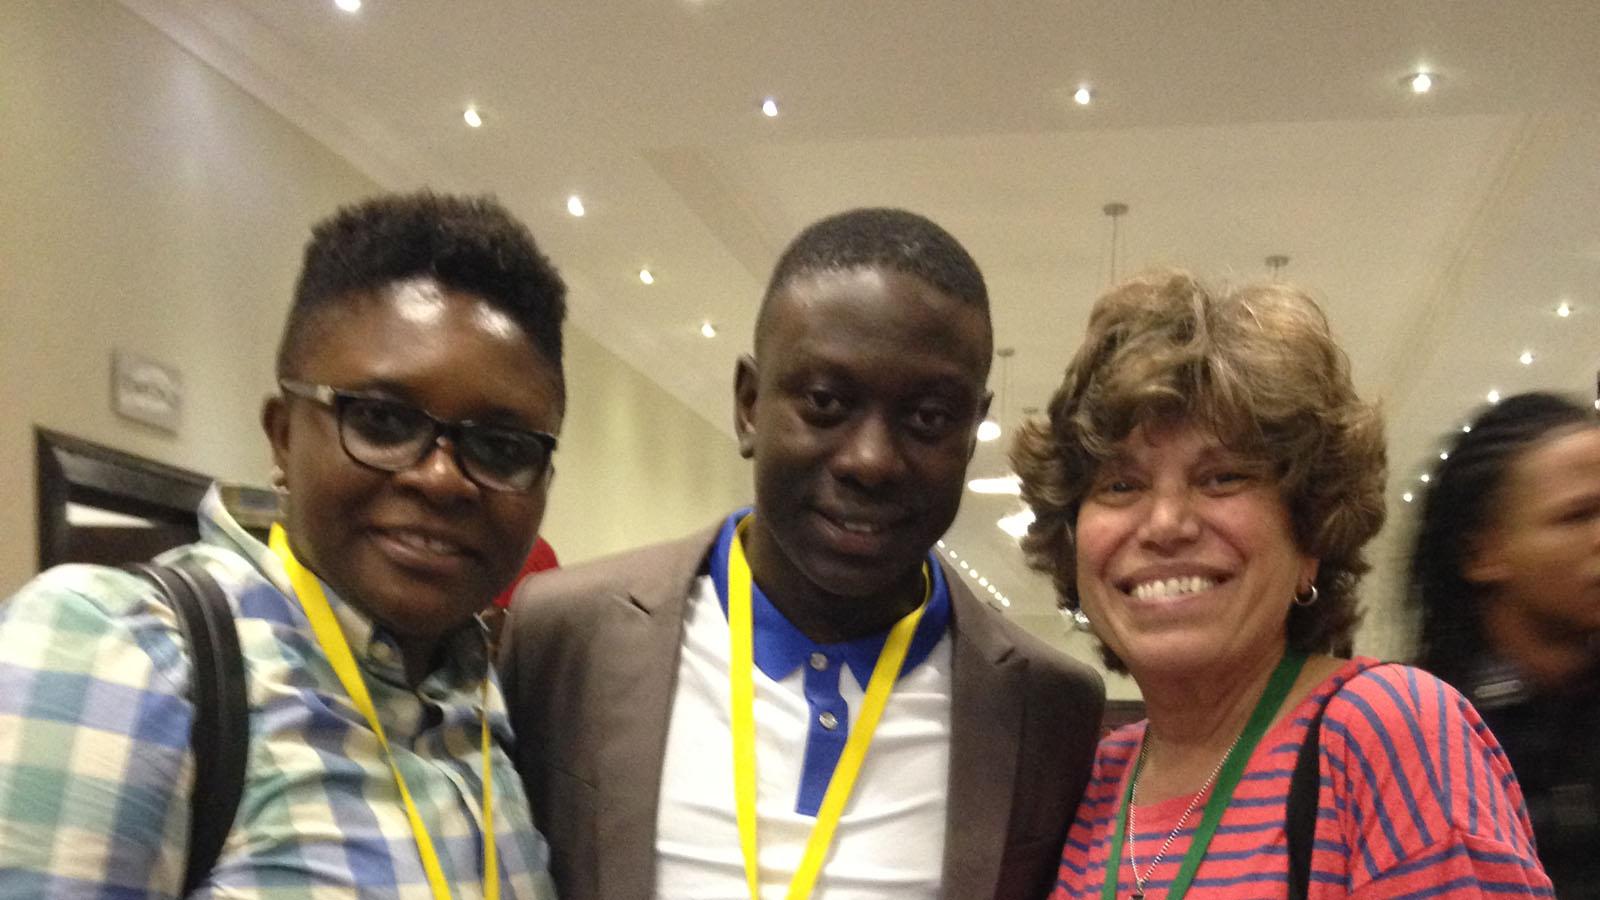 HRC Global Participates in Pan Africa ILGA in Johannesburg